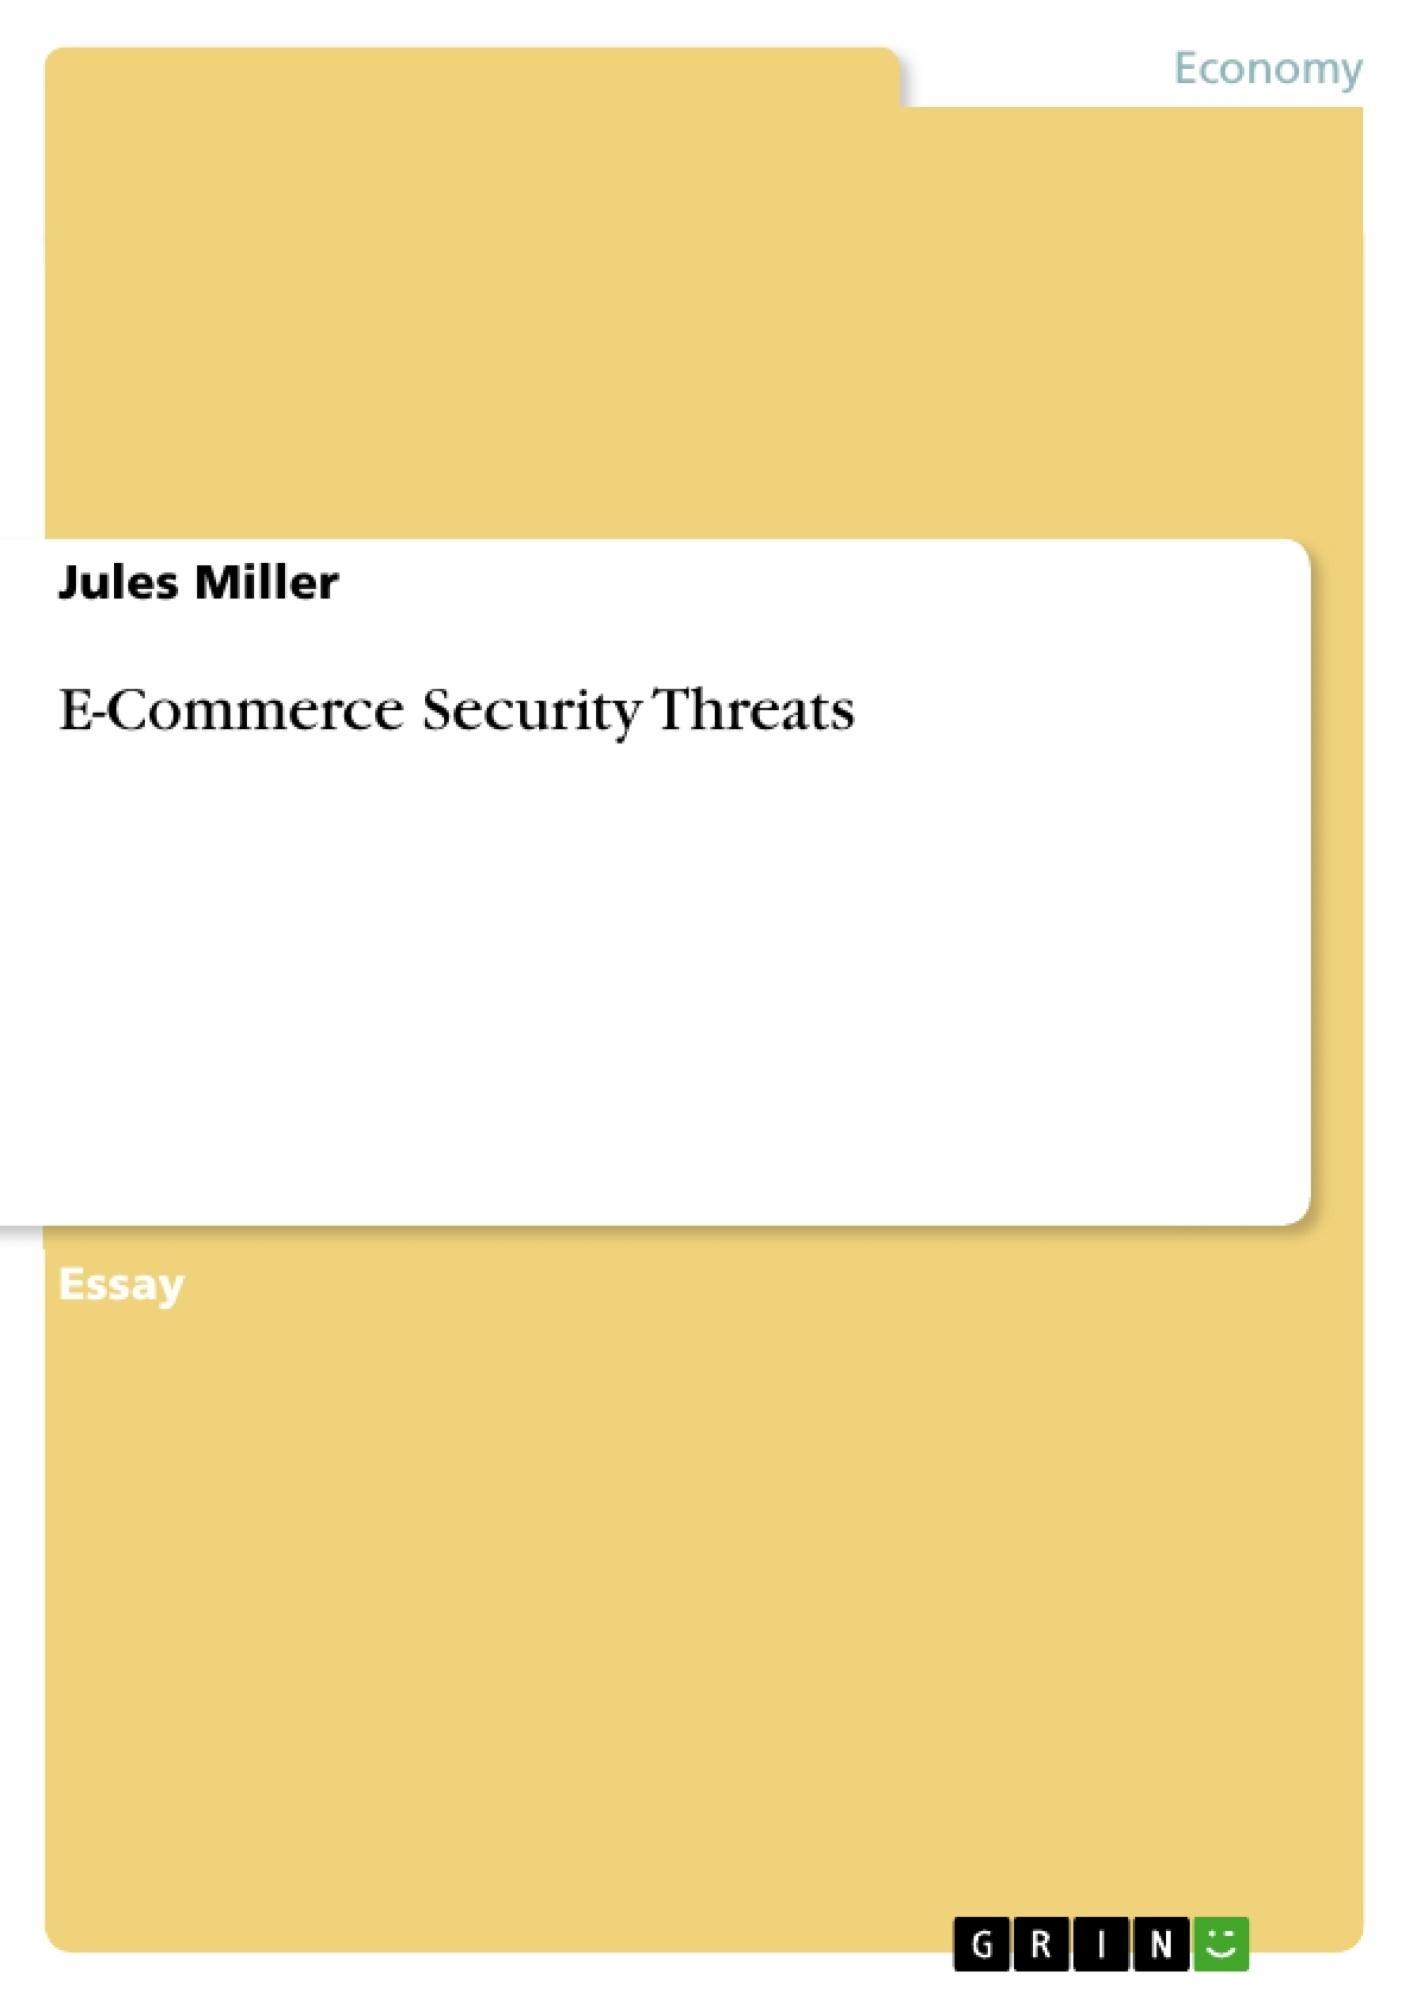 Dissertation report e commerce